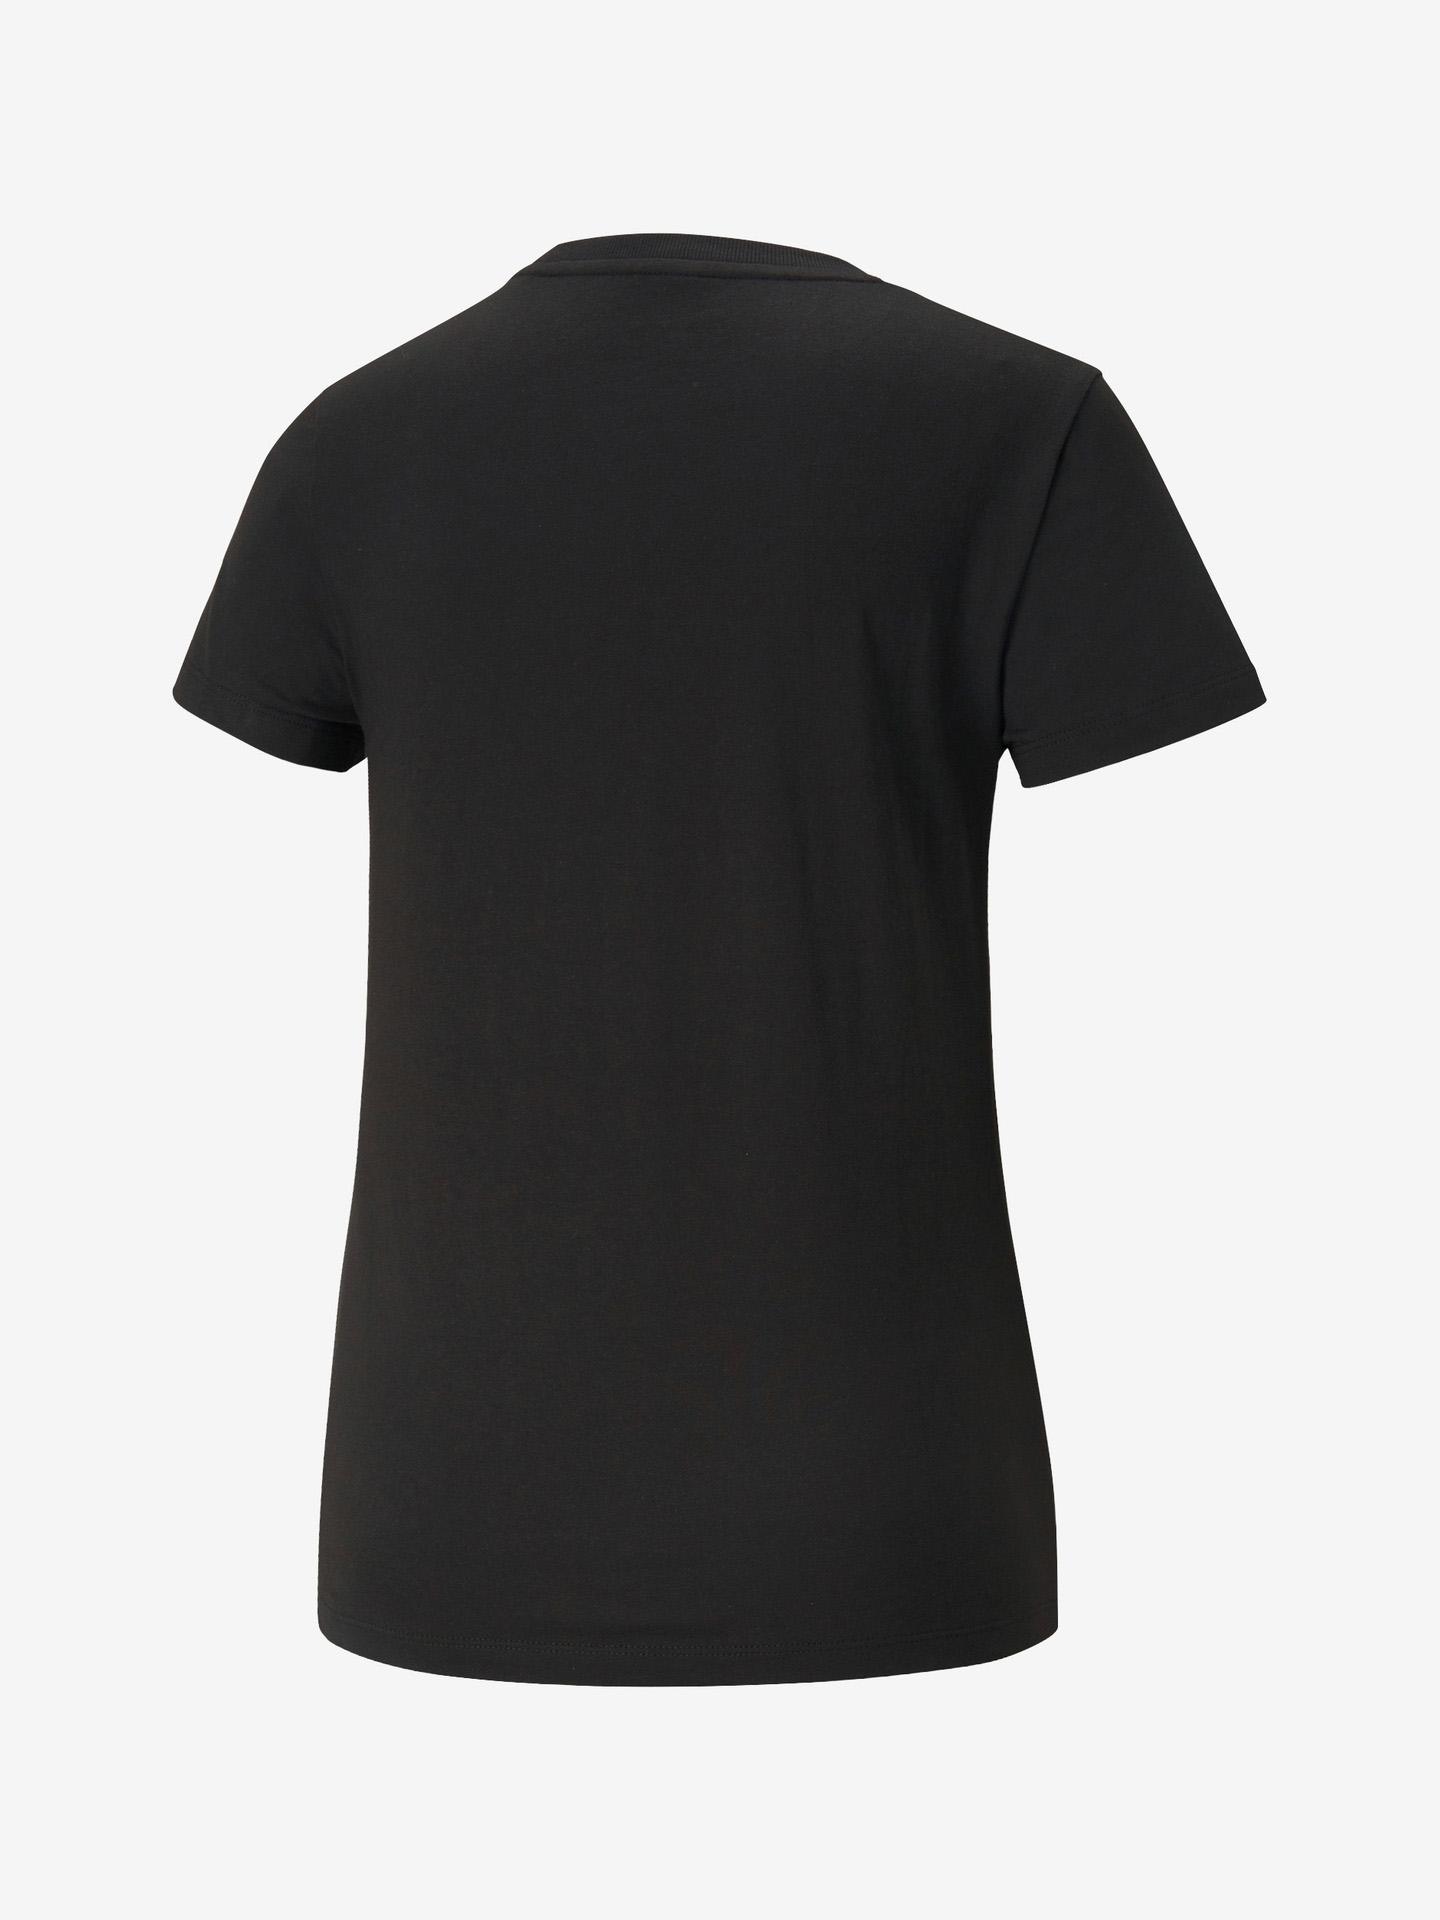 Puma INTL Graphic Koszulka Czarny